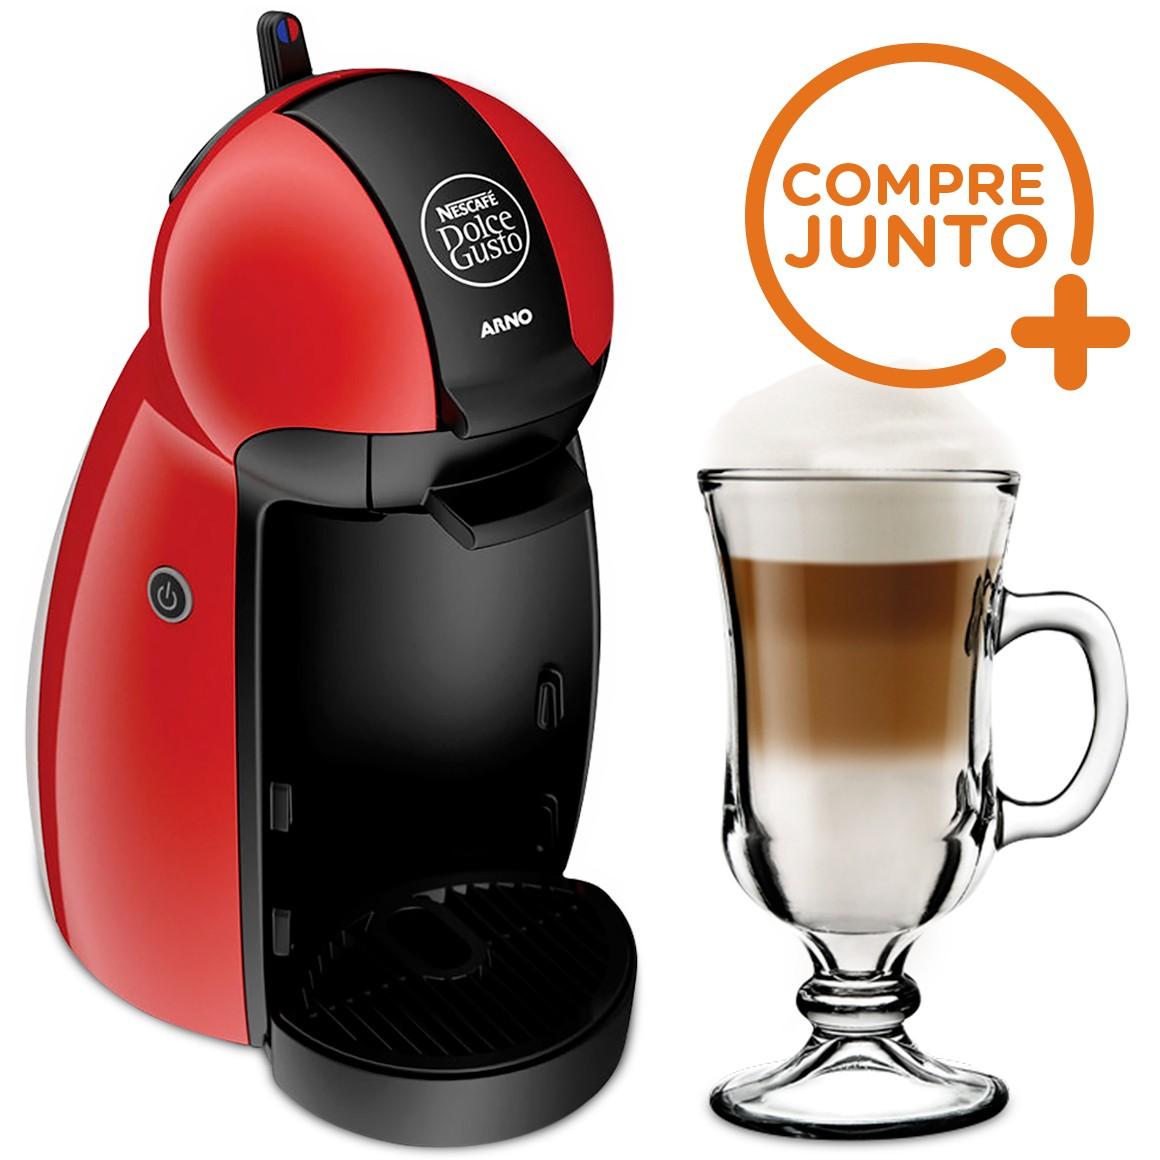 Cafeteira Expresso Dolce Gusto Piccolo Vermelha 110v + 1 Taça Nevada Irish Coffee 130ml